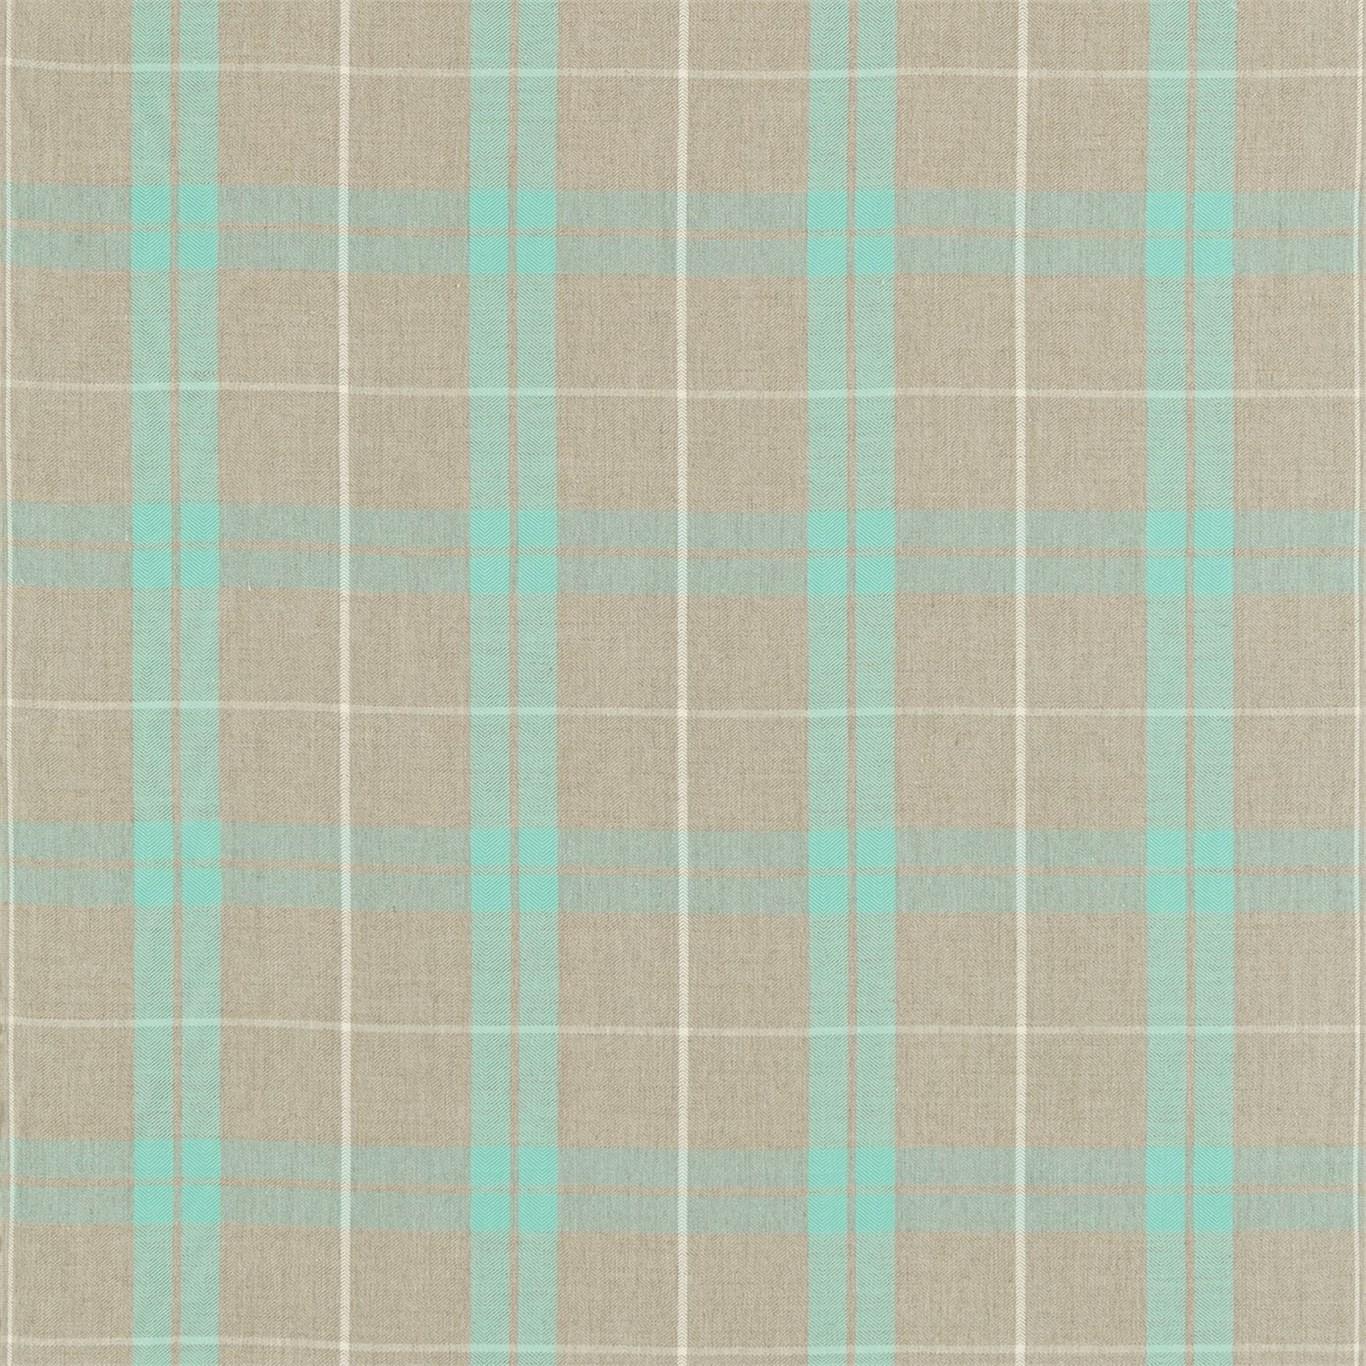 Fabrics and Wallpapers Akin HJOS130531 Folia Checks and Stripes 1366x1366